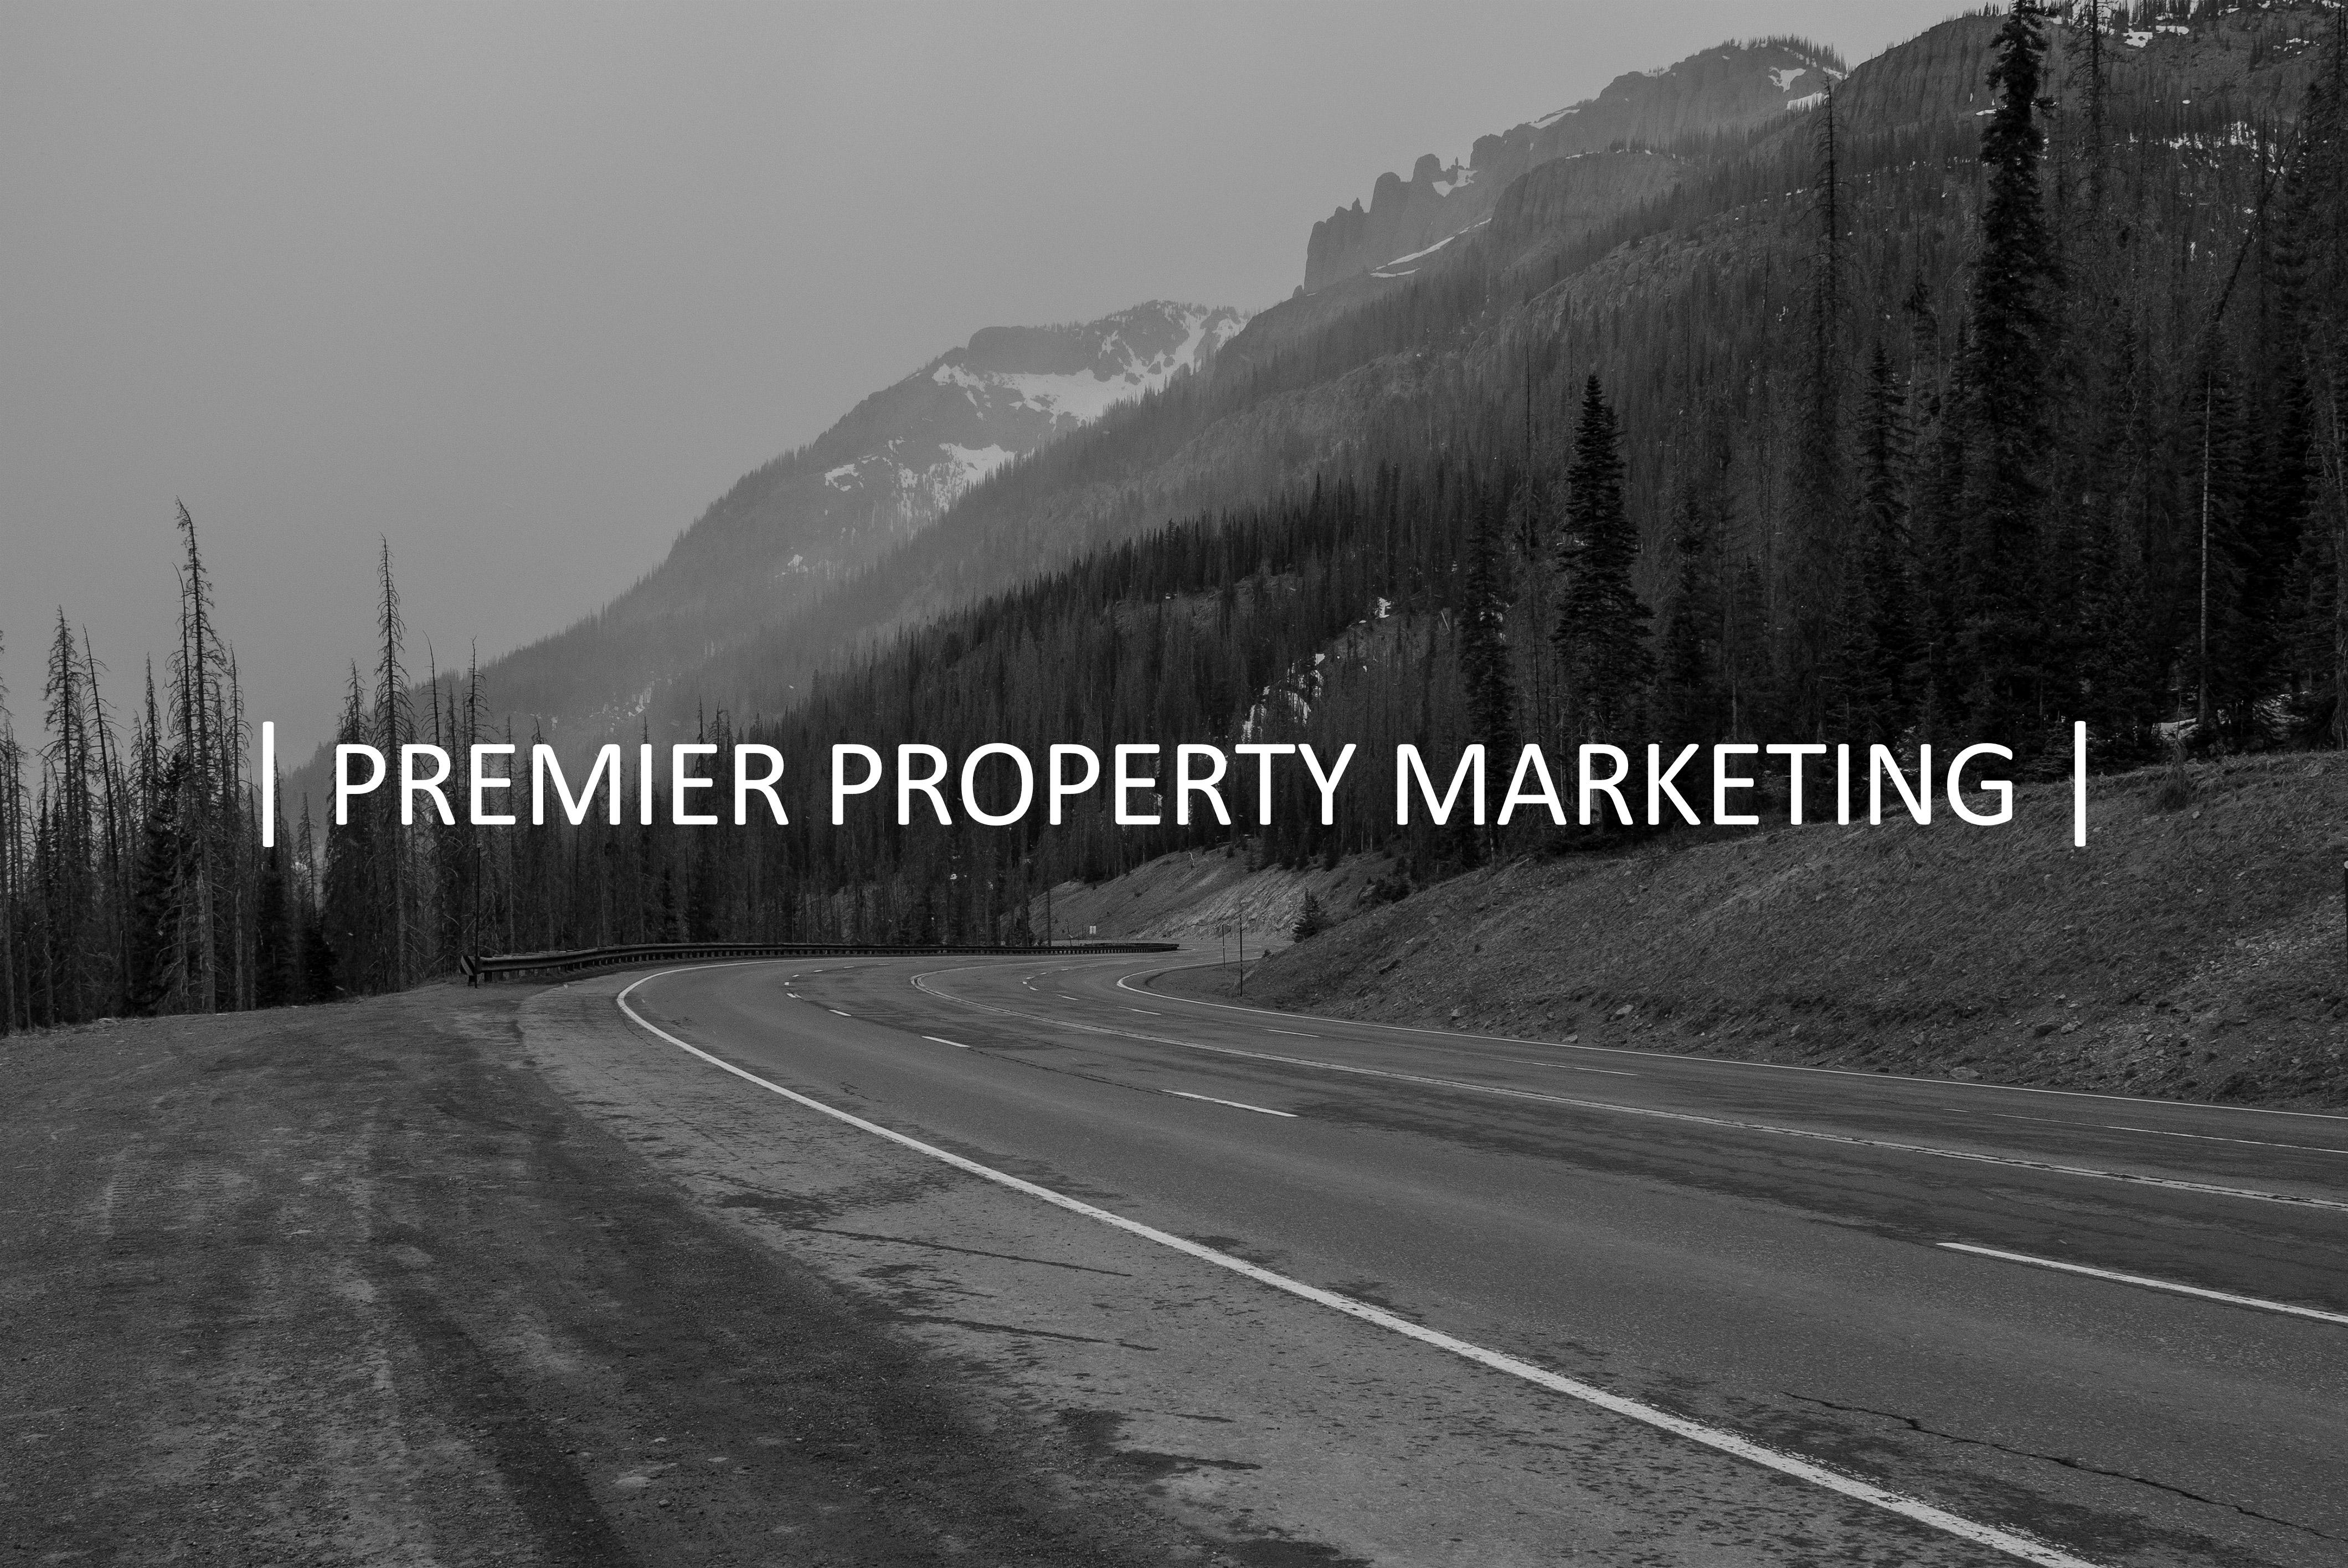 Premiere-Property-Marketing